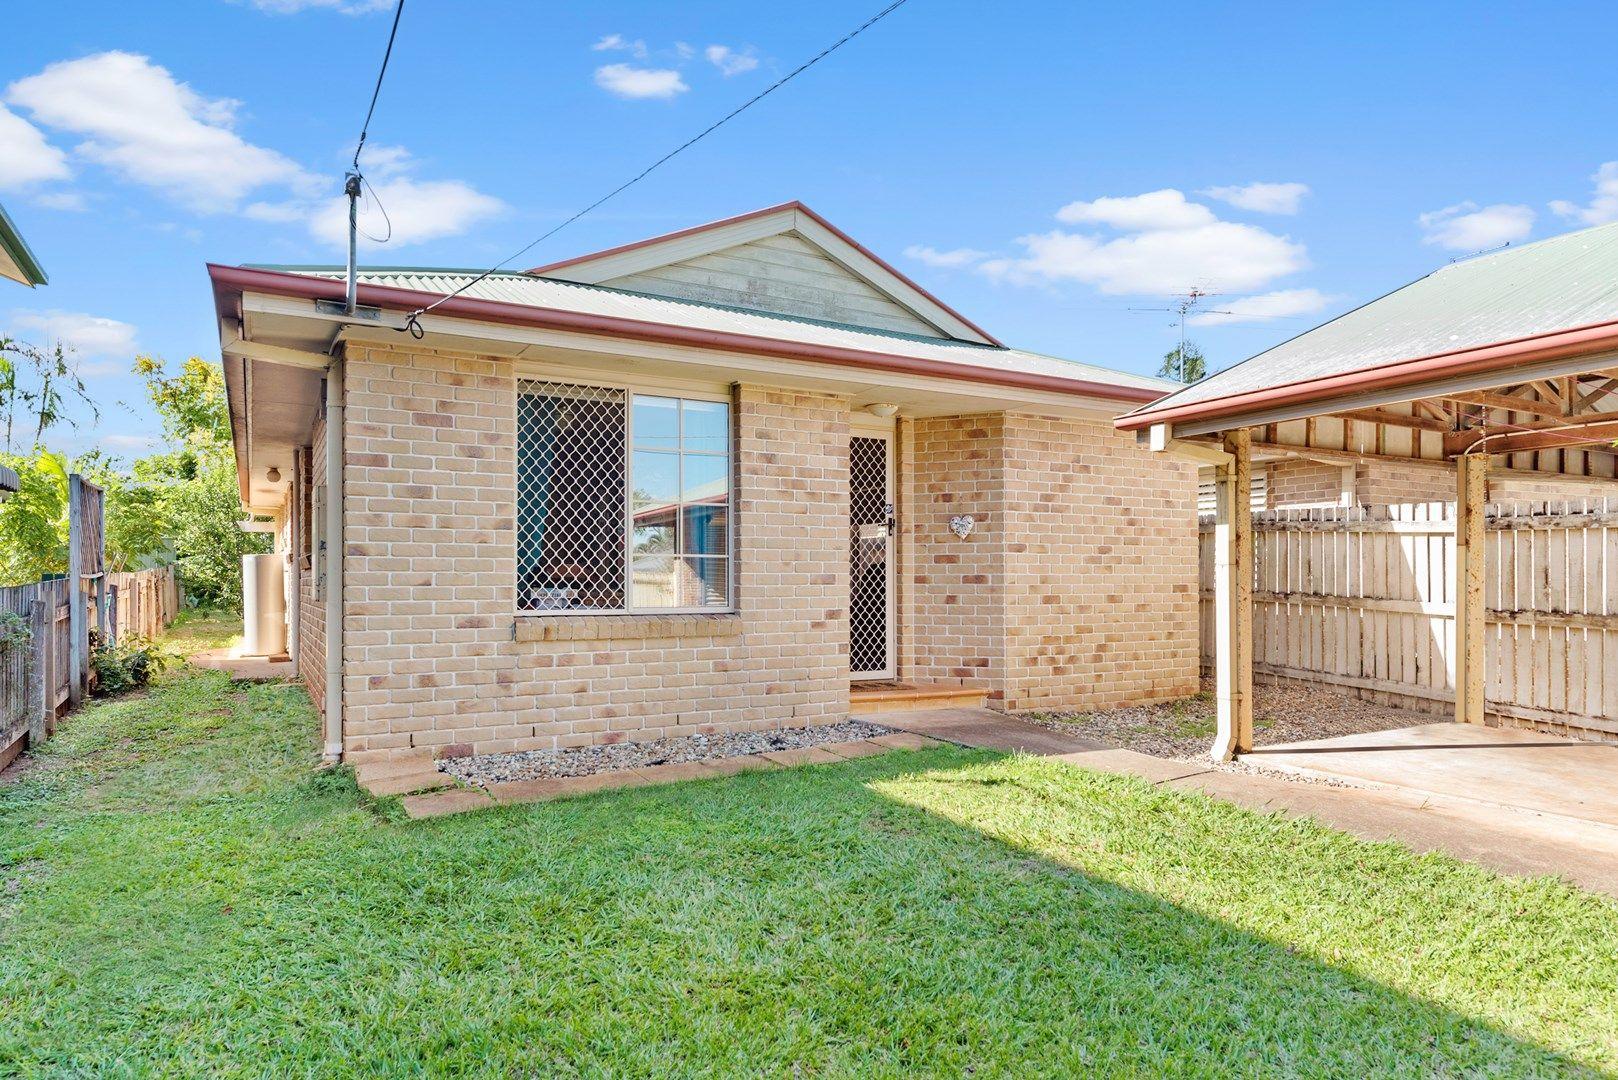 44A Cutts Street, Margate QLD 4019, Image 0